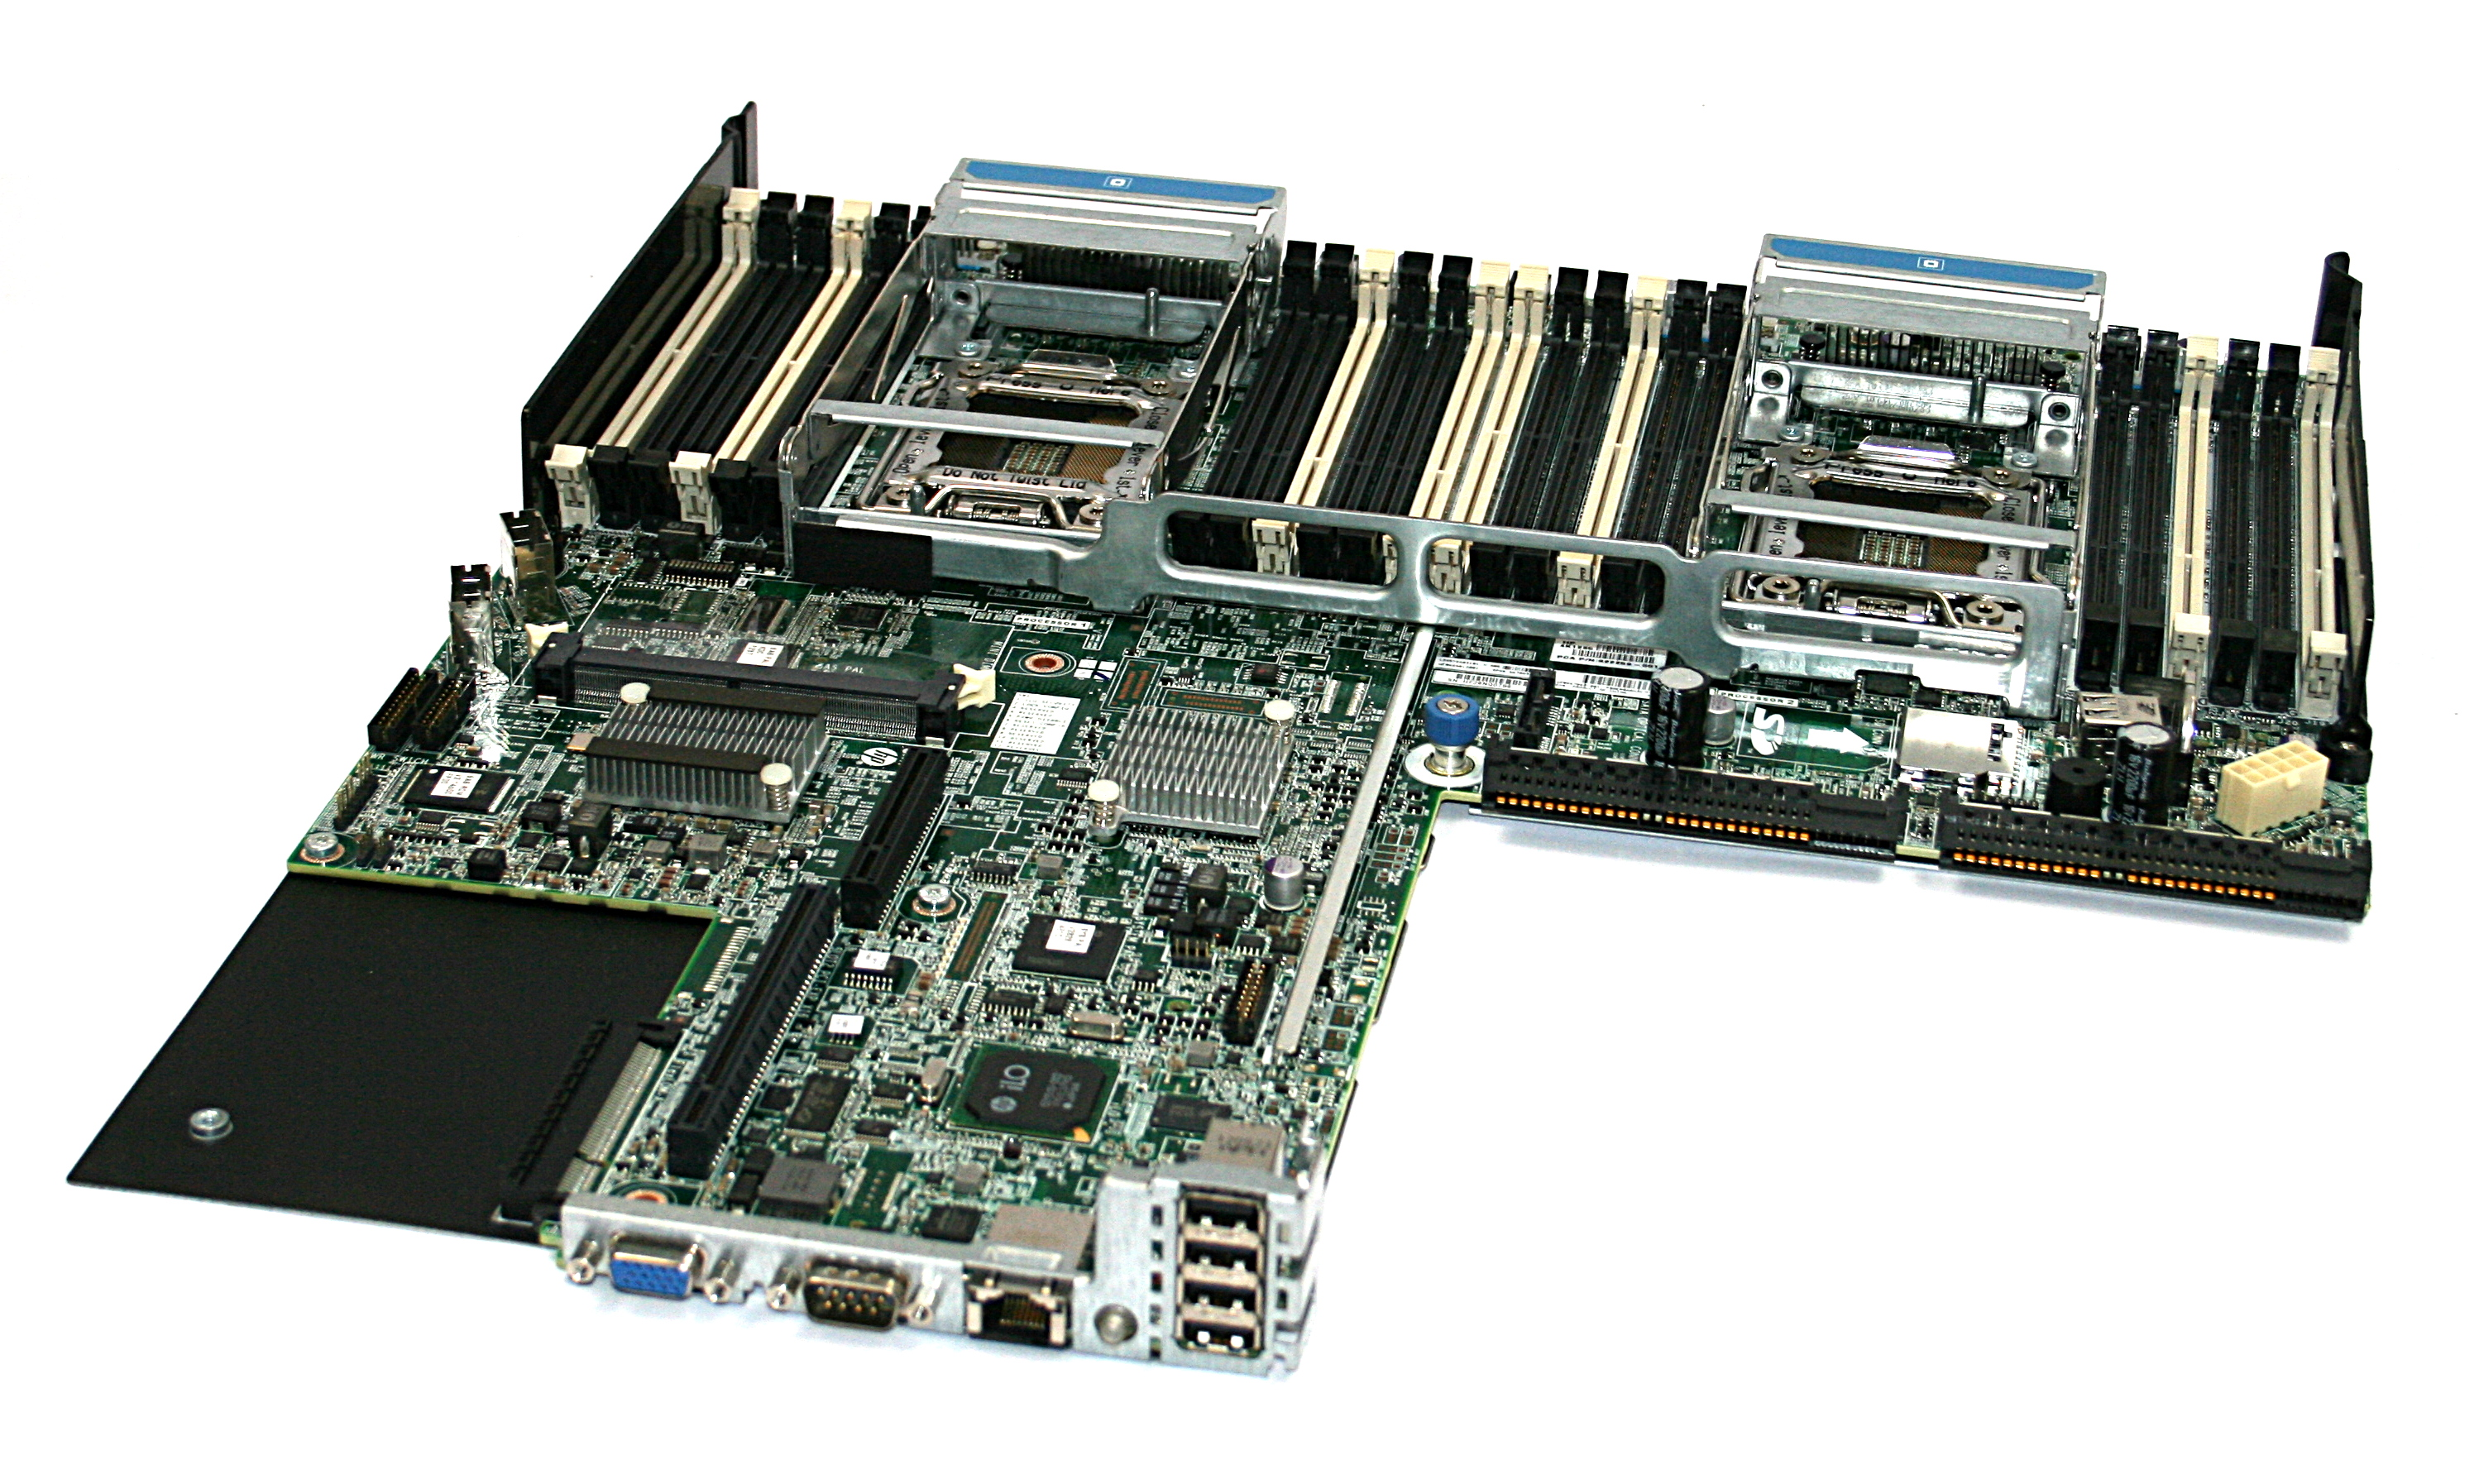 HP 667865-001 Proliant DL360p Gen8 Dual Socket LGA2011 Motherboard With Tray